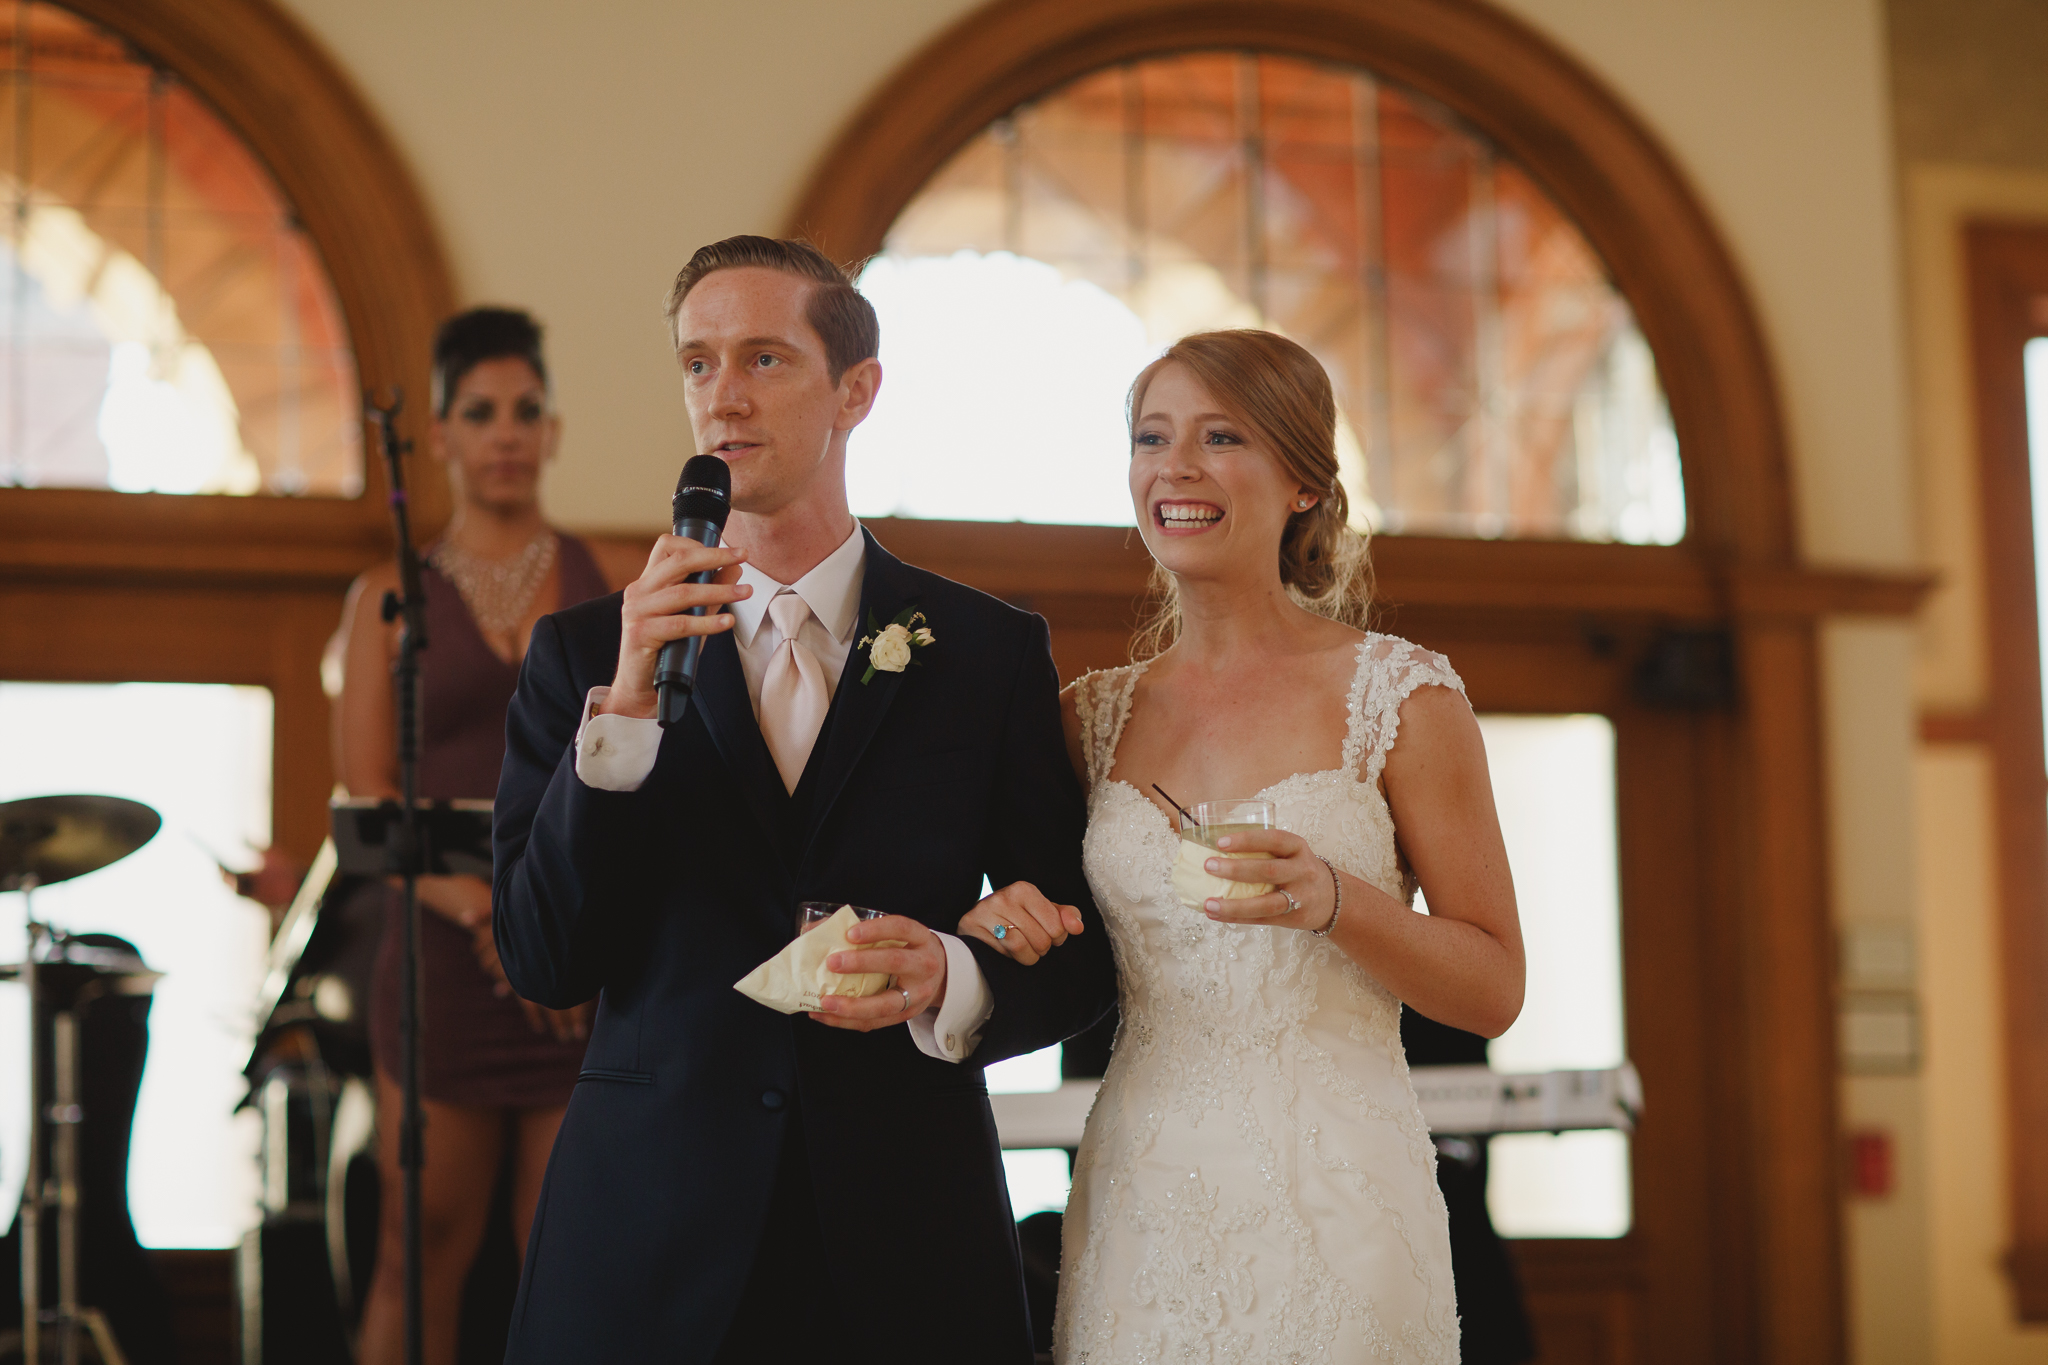 Michael and Kelly - the ashton depot - wedding DFW - wedding photographer- elizalde photography (95 of 150).jpg